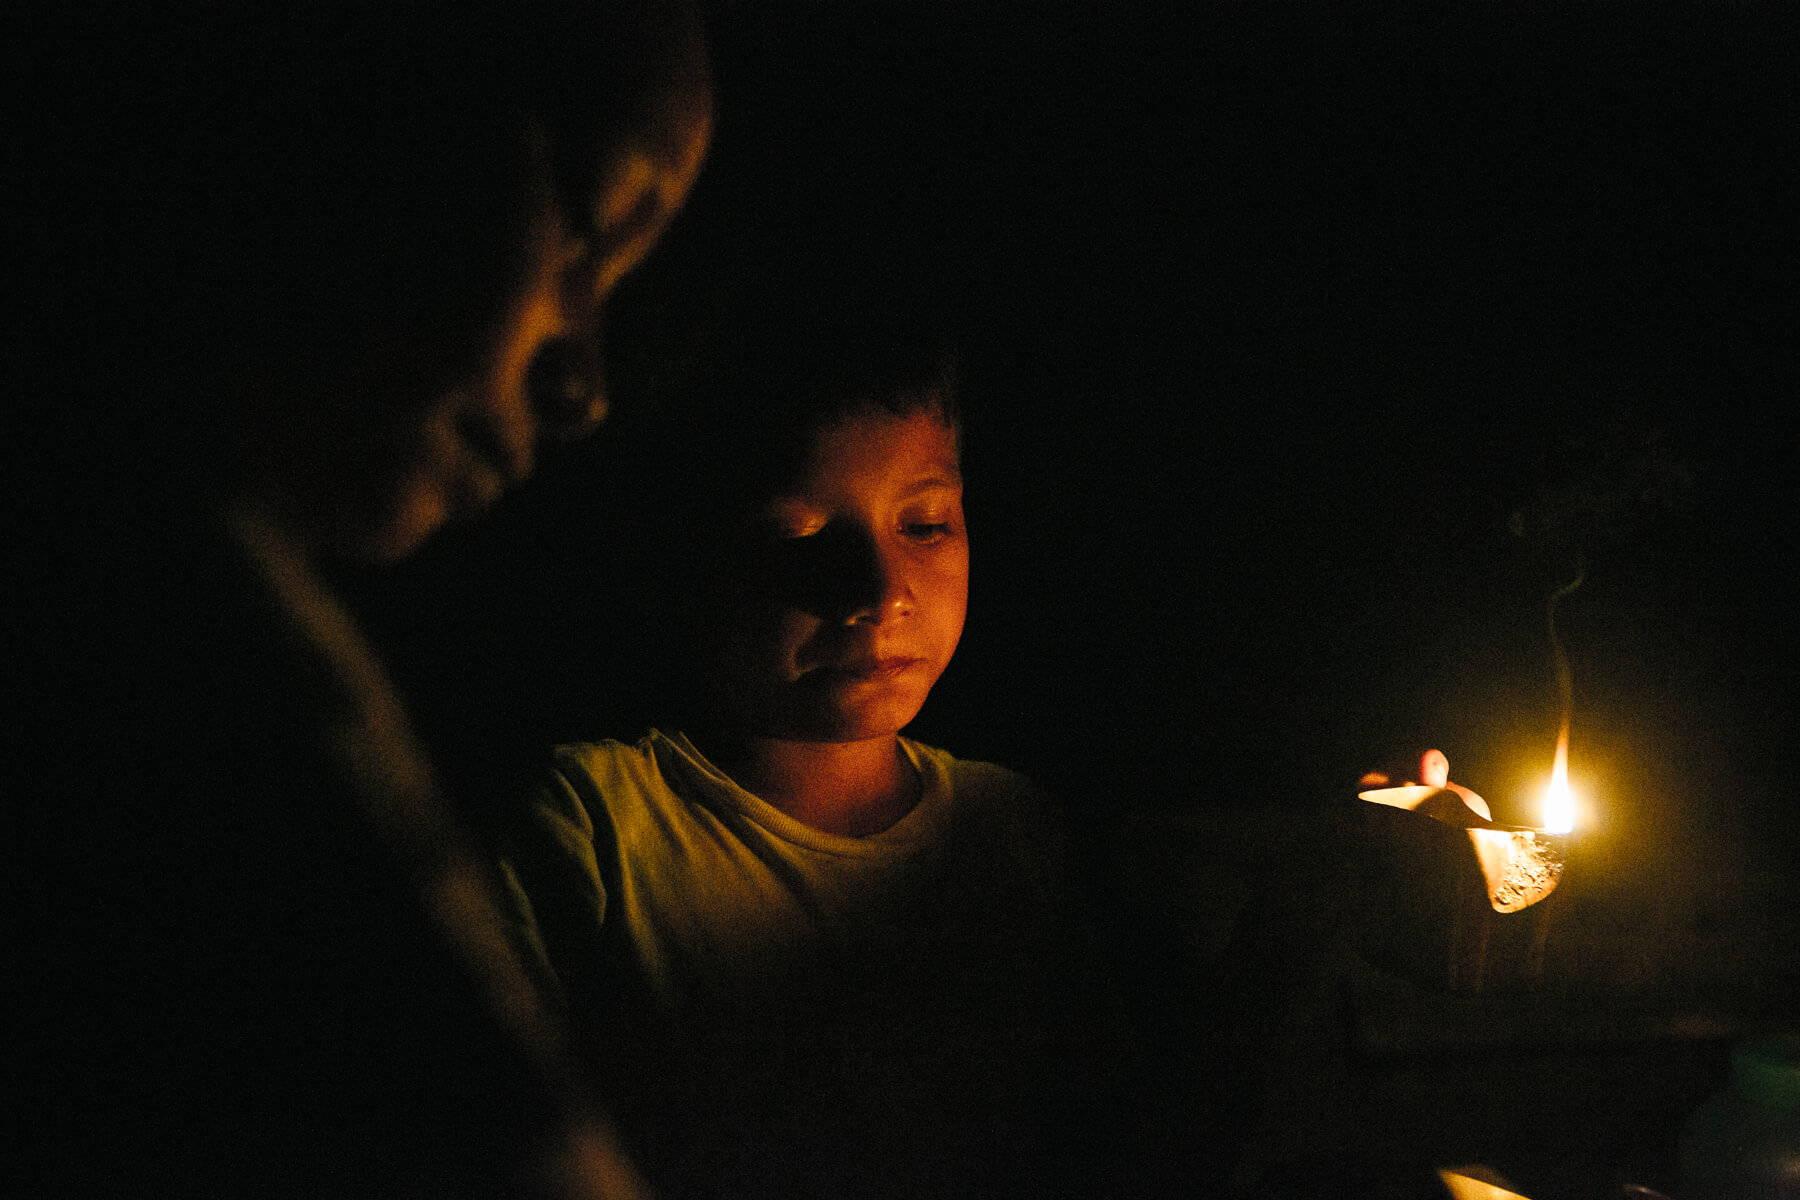 Porqué Light for Humanity problema amazonas lamparas queroseno